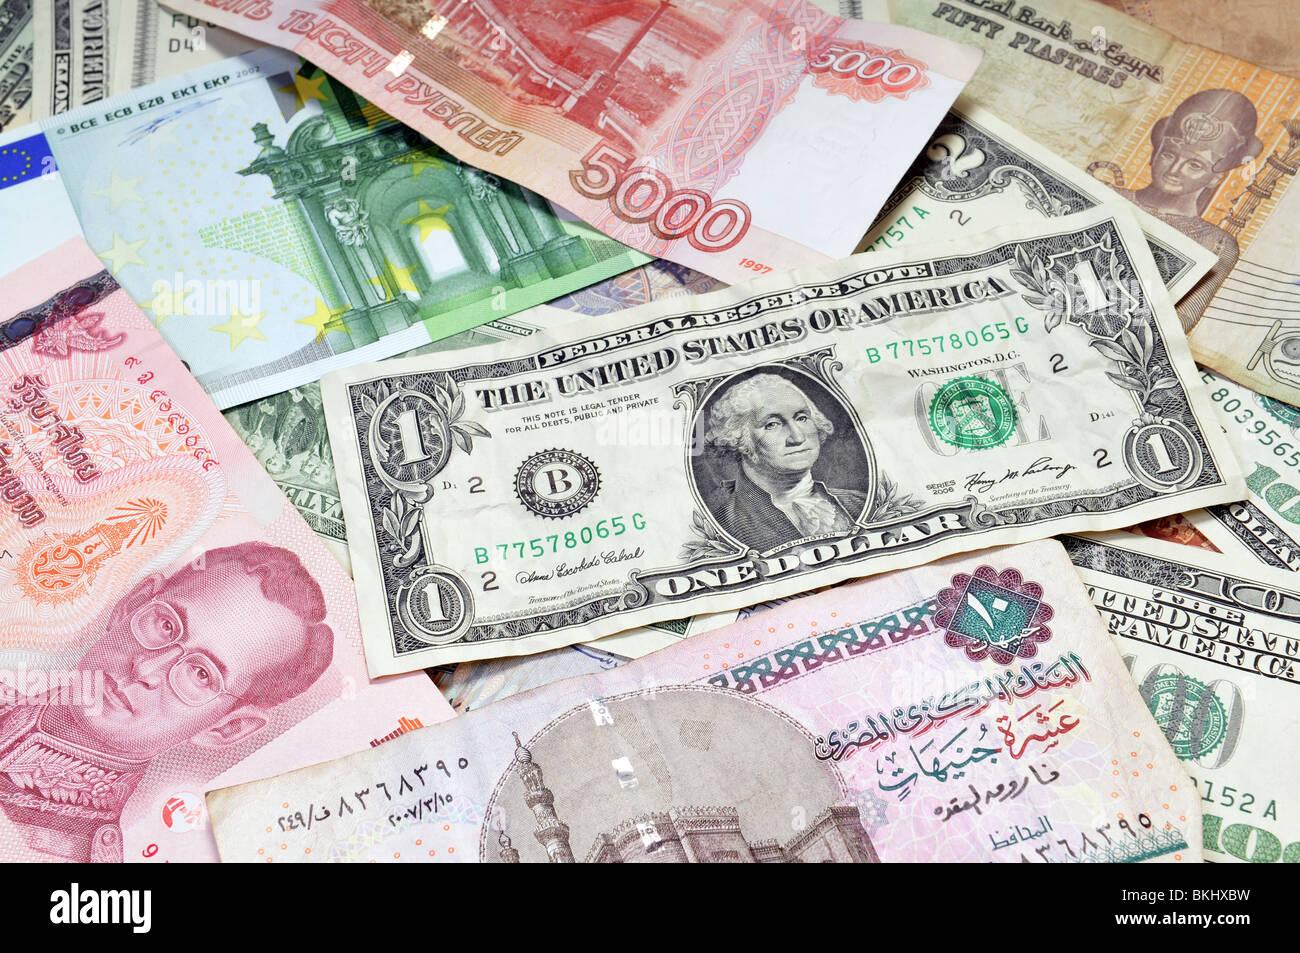 Money of the world - Dollars, euros, russian rubles, thai baht, turkish lira, egypt pounds - Stock Image